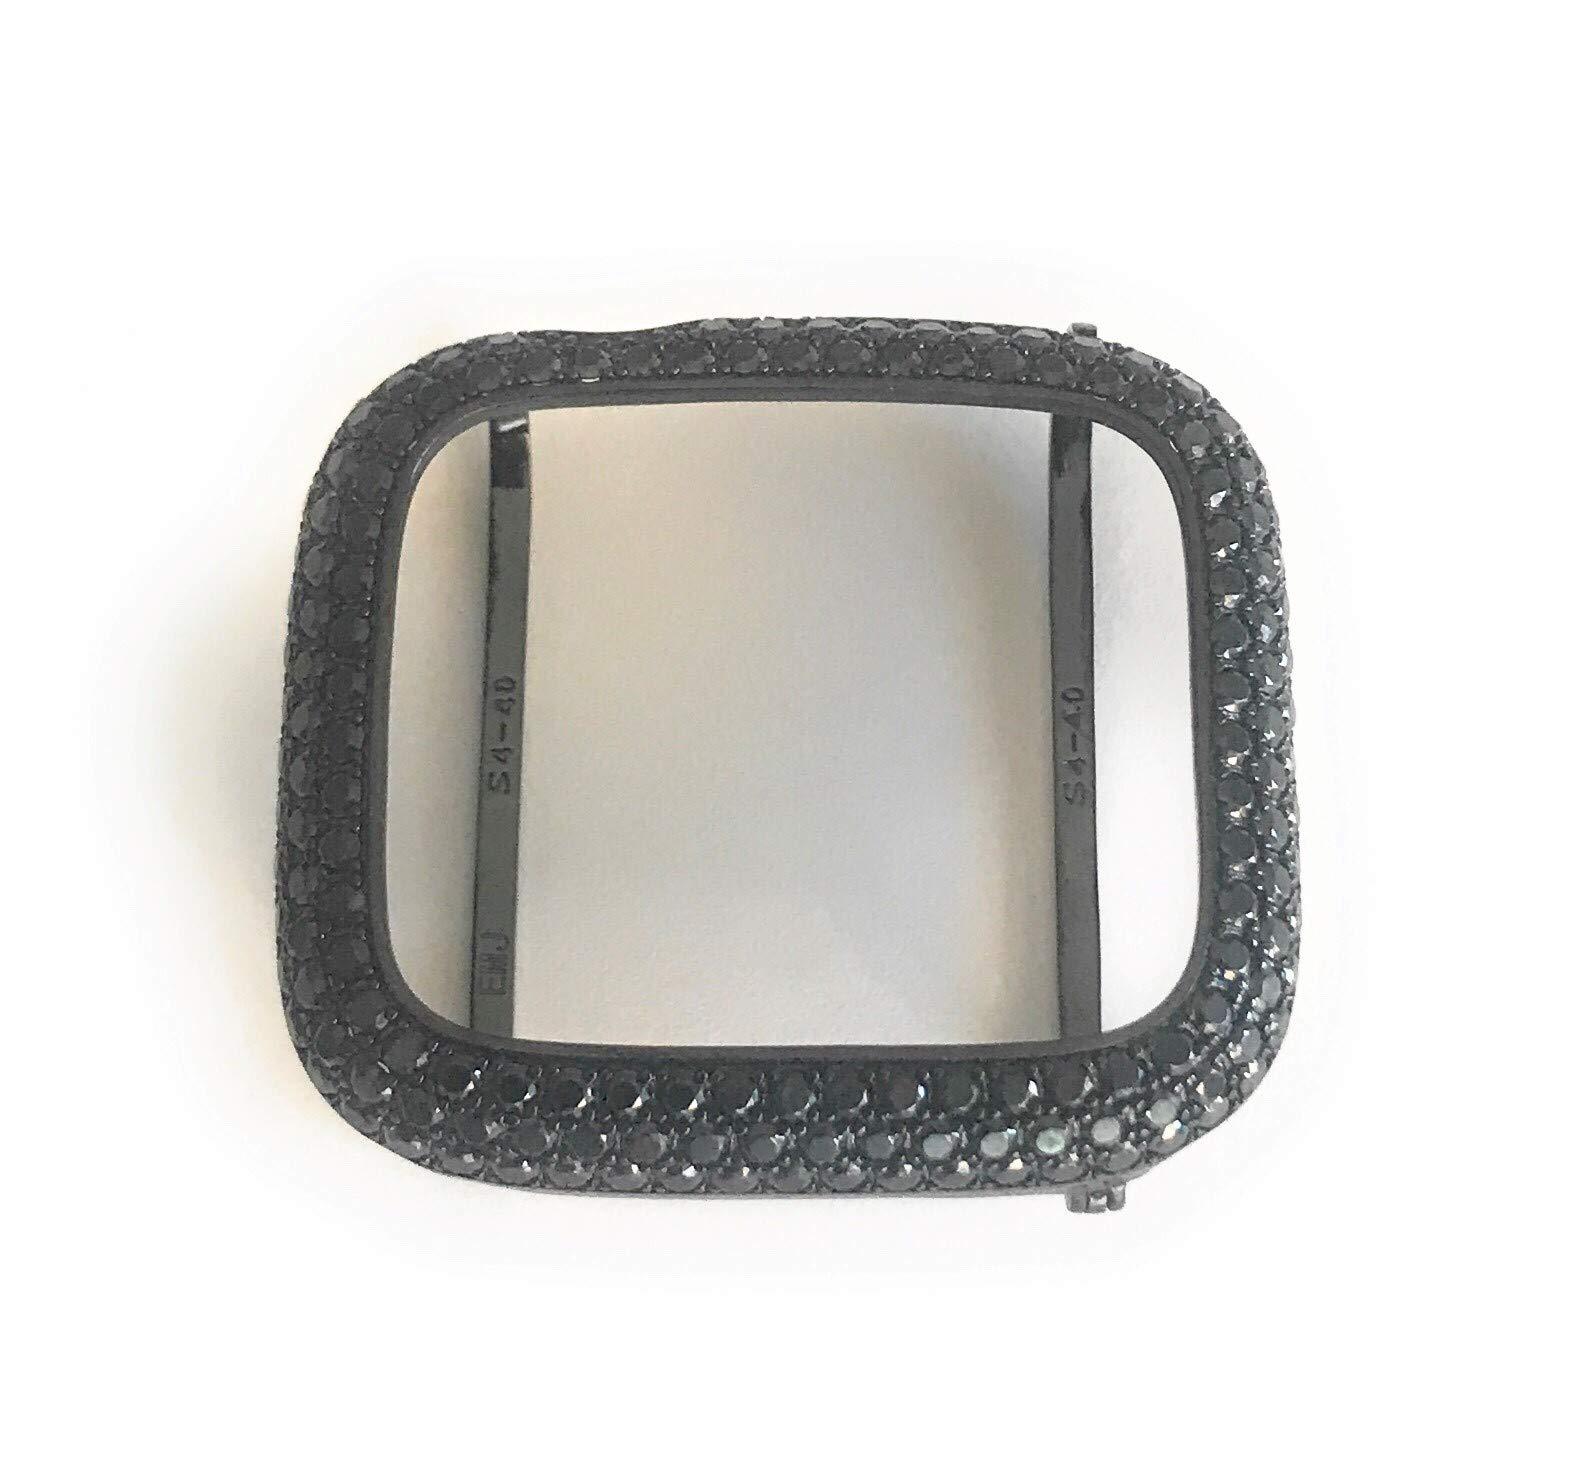 EMJ Bling Apple Watch Series 4 S4 Bezel Case Face Cover Bumper Zirconia Lab Diamond Black 40 mm (40)